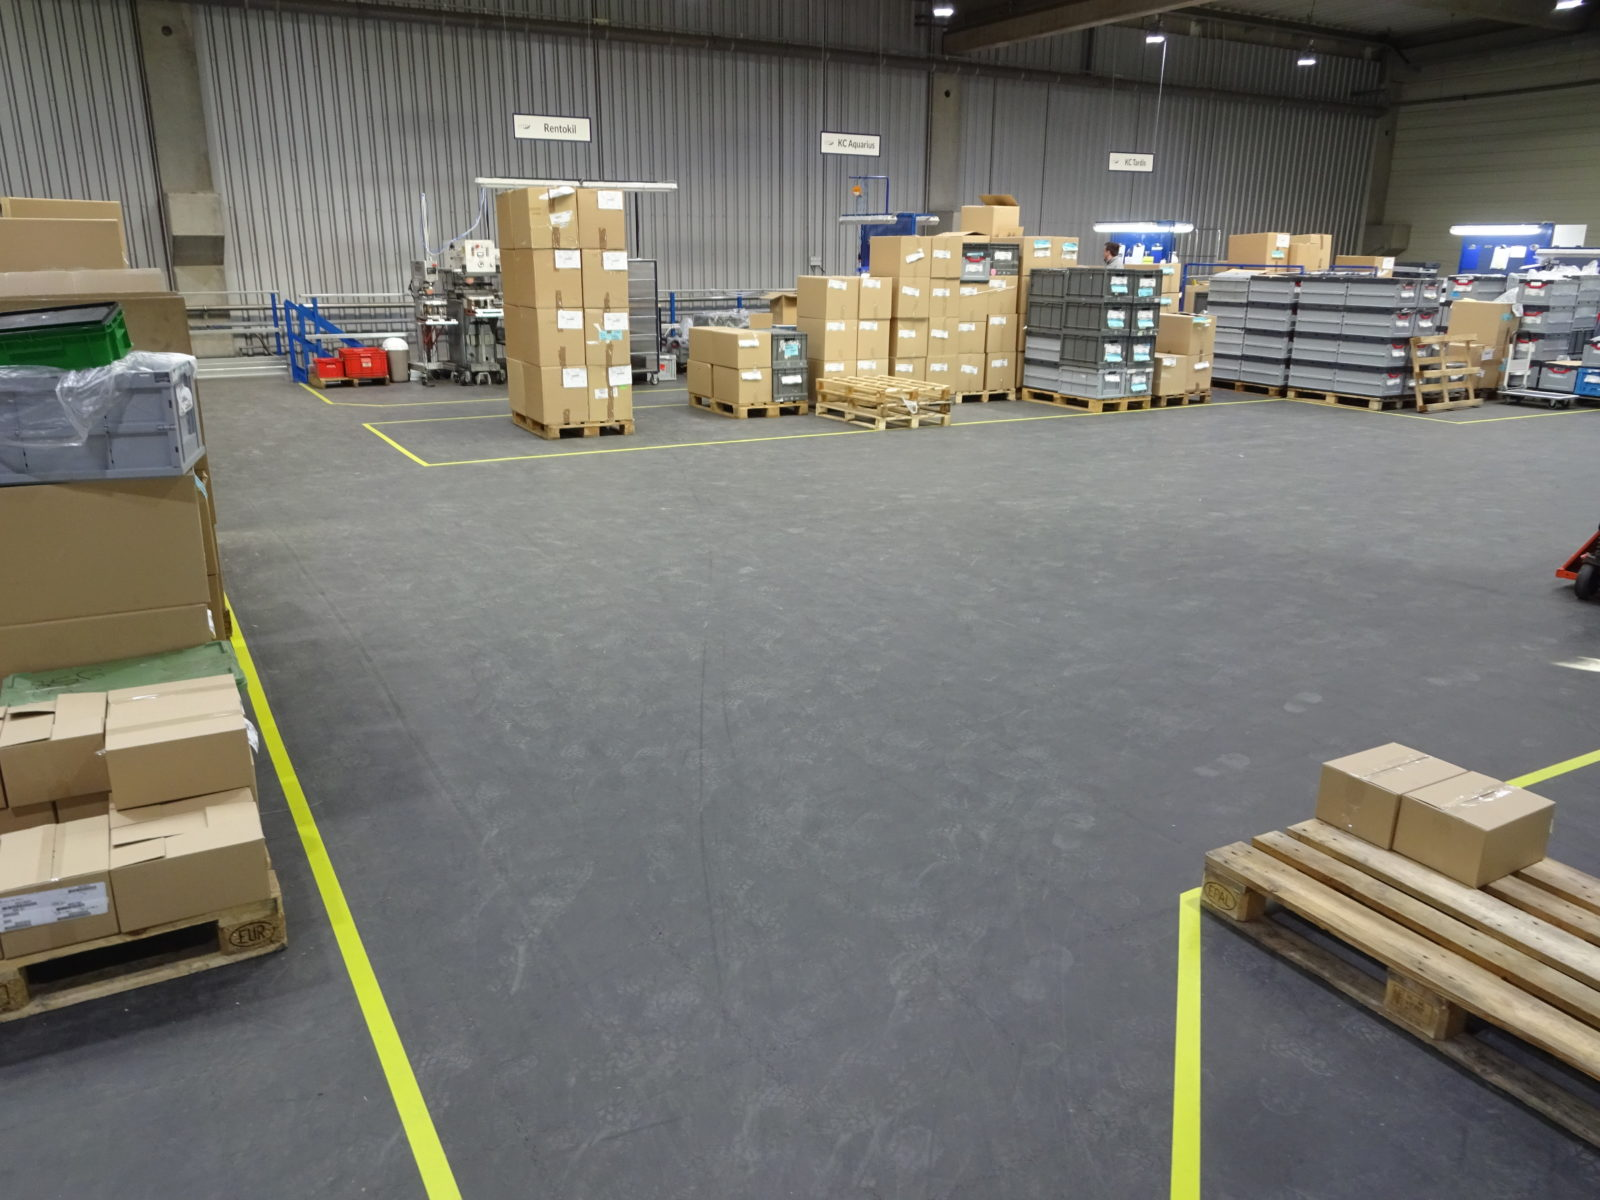 industrieboden-gewerbeboden-jp-mechanic-pvc-fliese-platte-lager-5